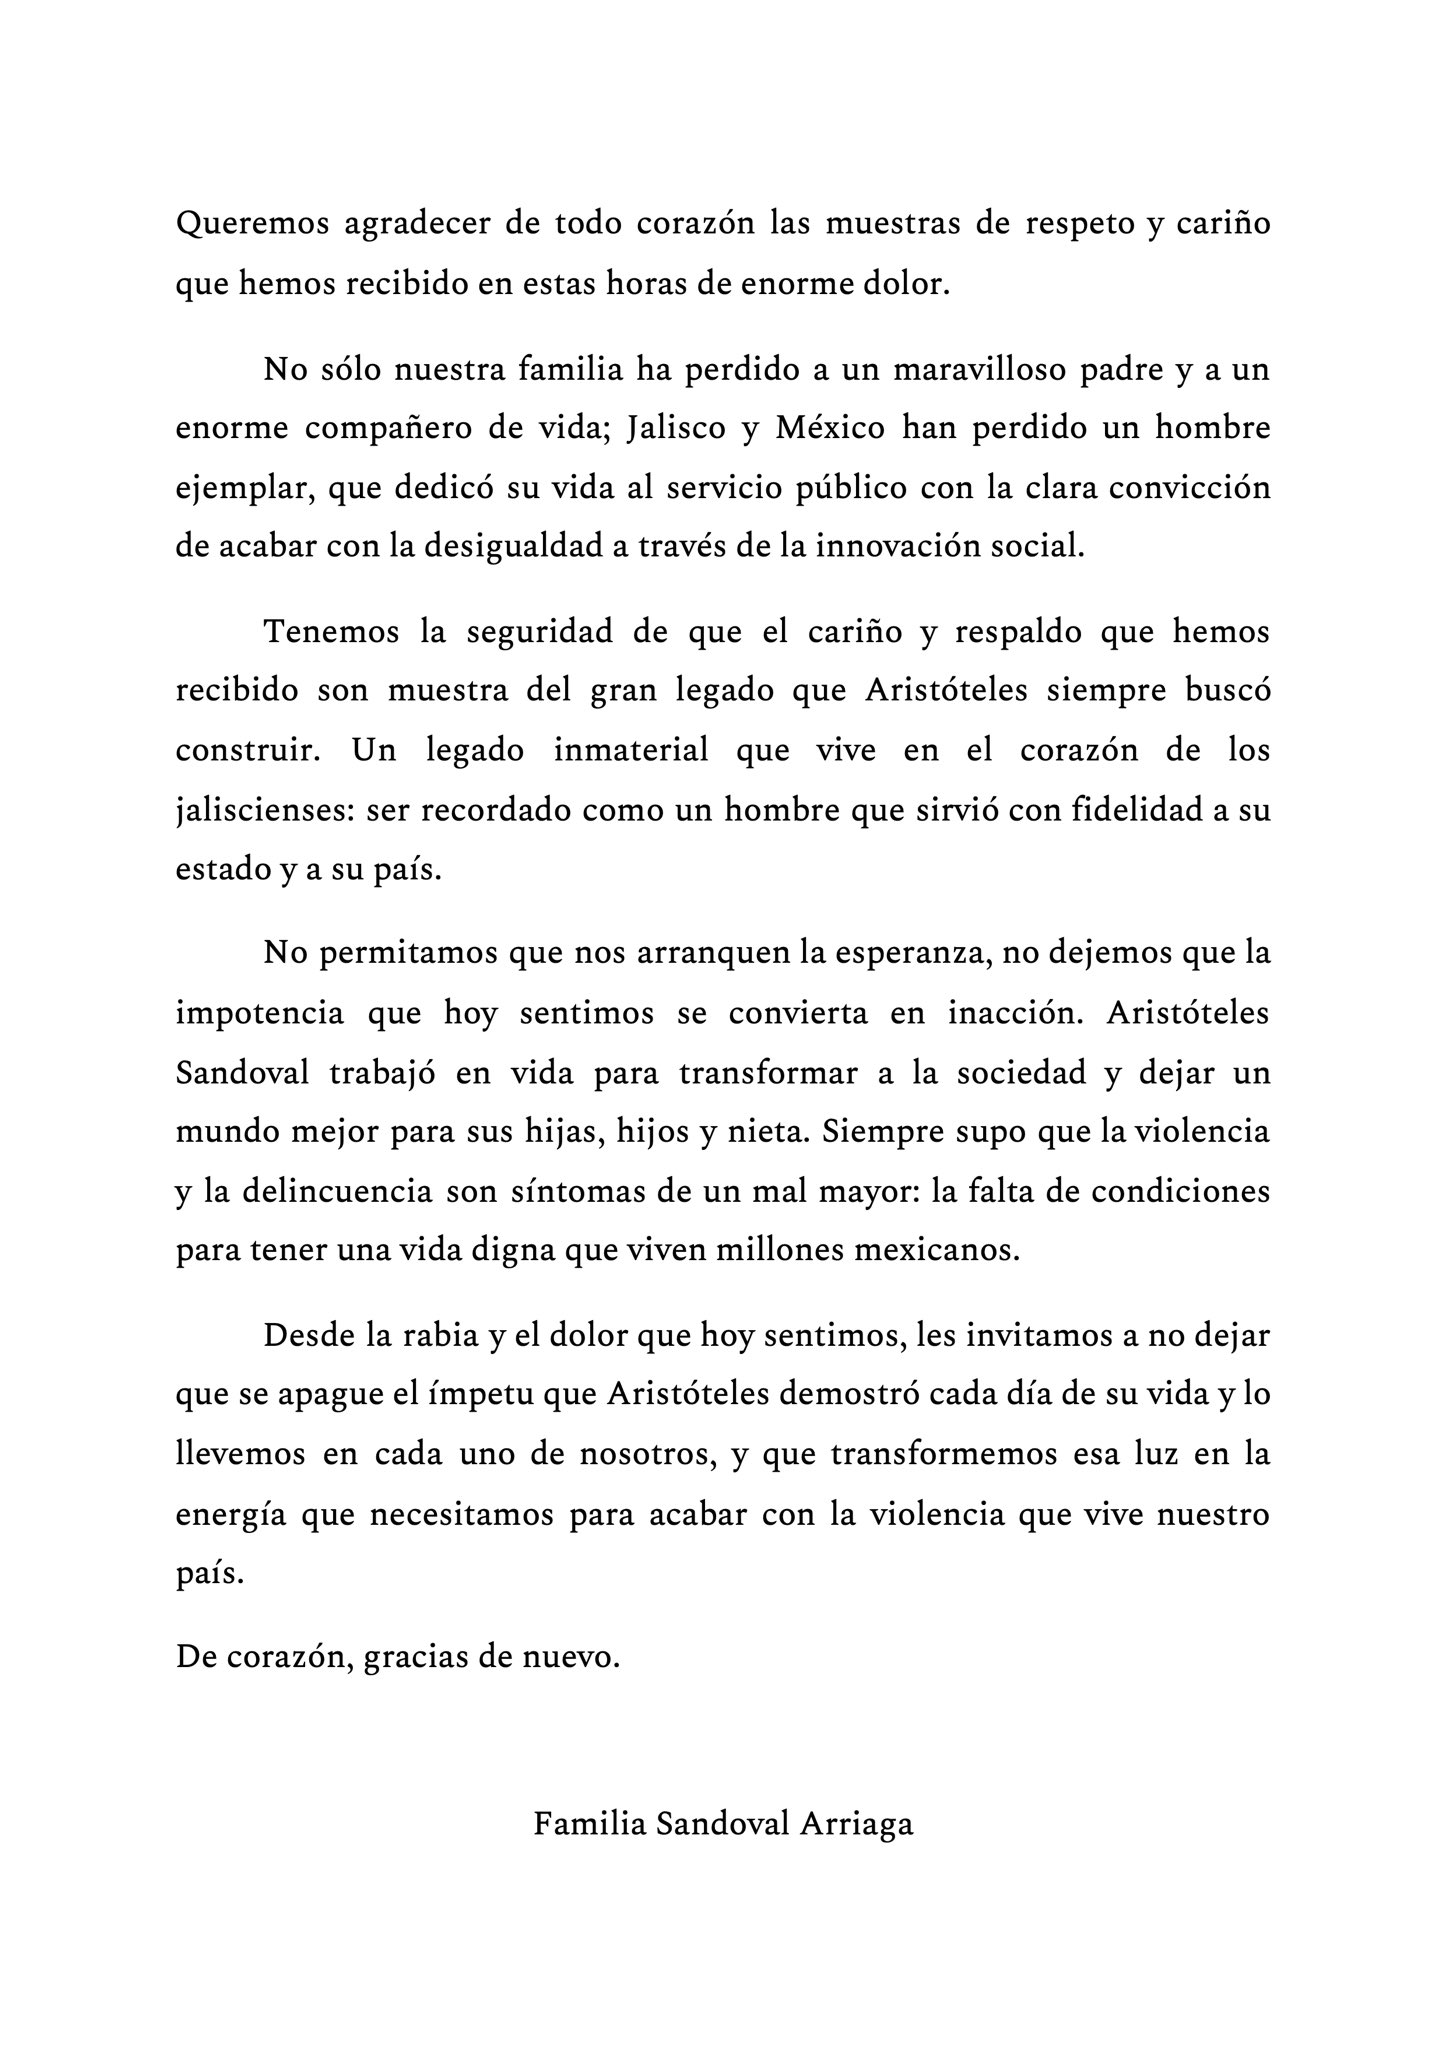 Fue asesinado Aristoteles Sandoval exgobernador de Jalisco 1